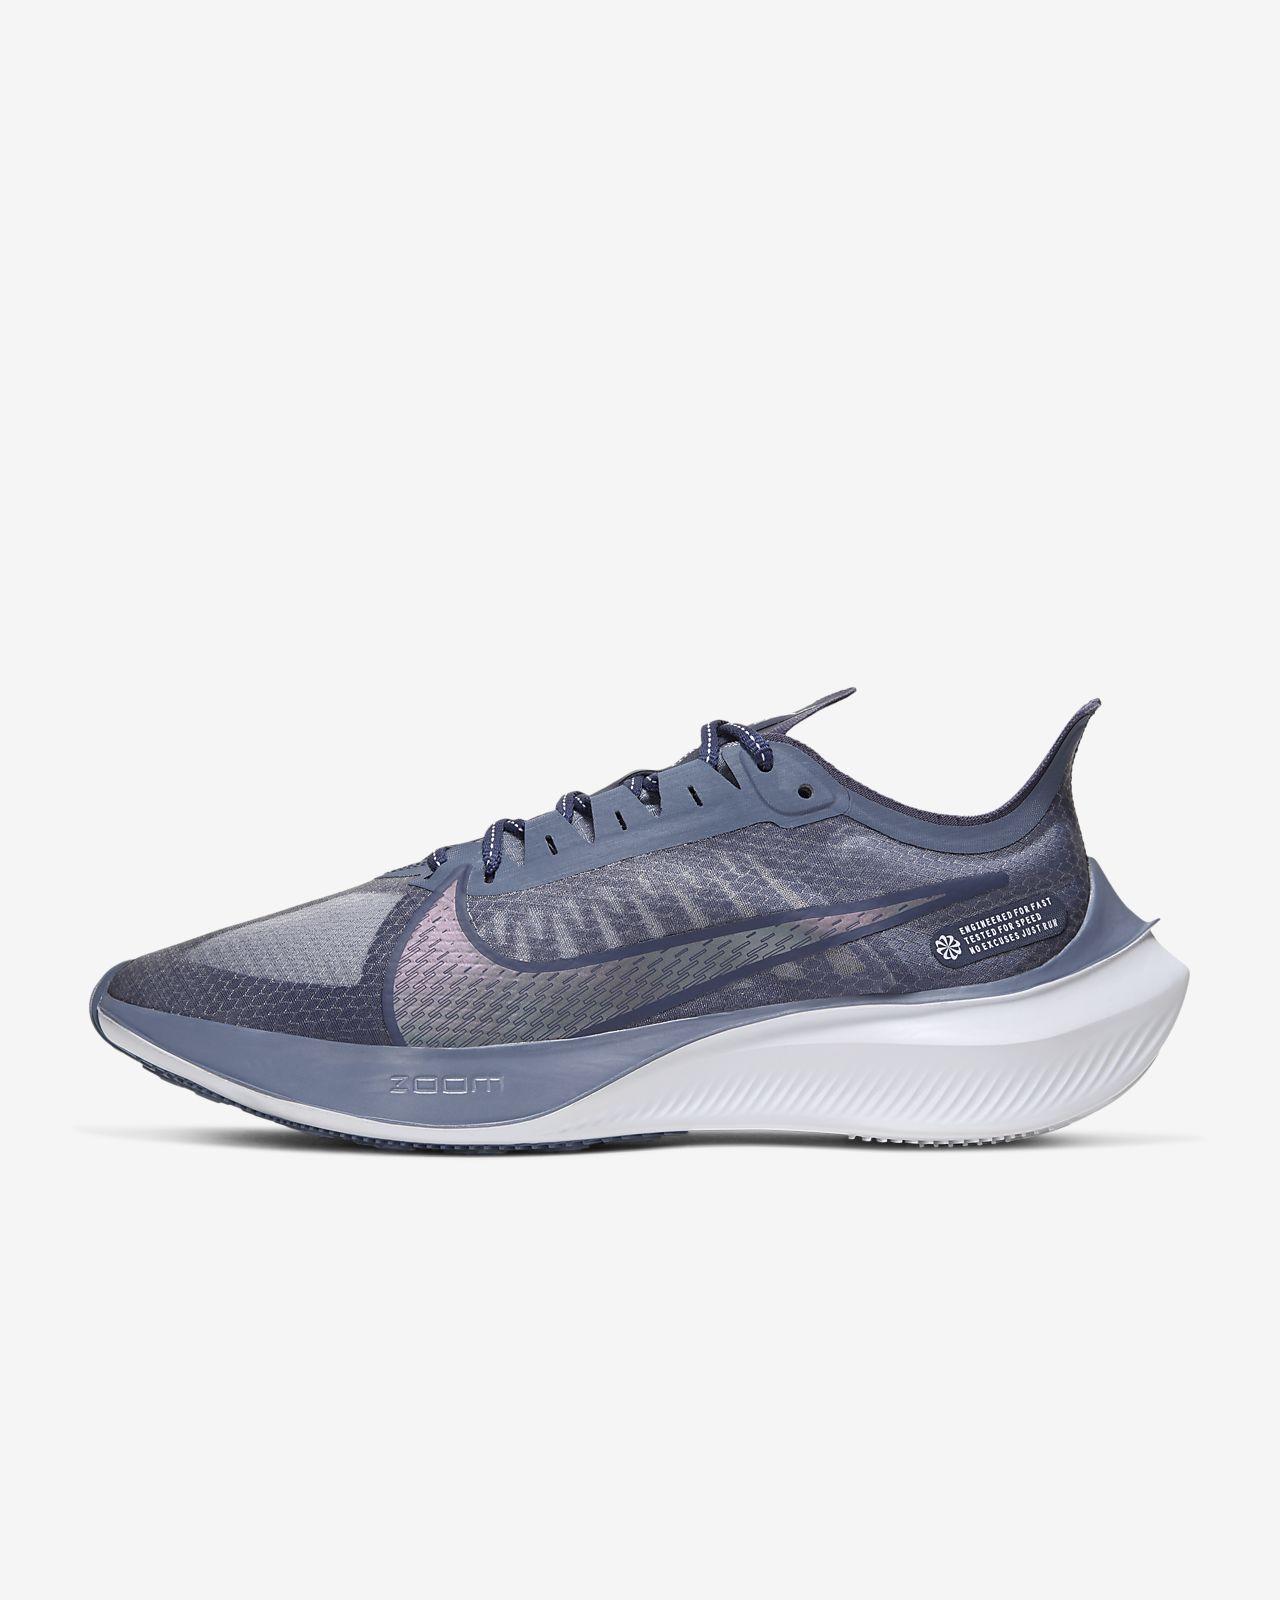 Calzado de running para mujer Nike Zoom Gravity